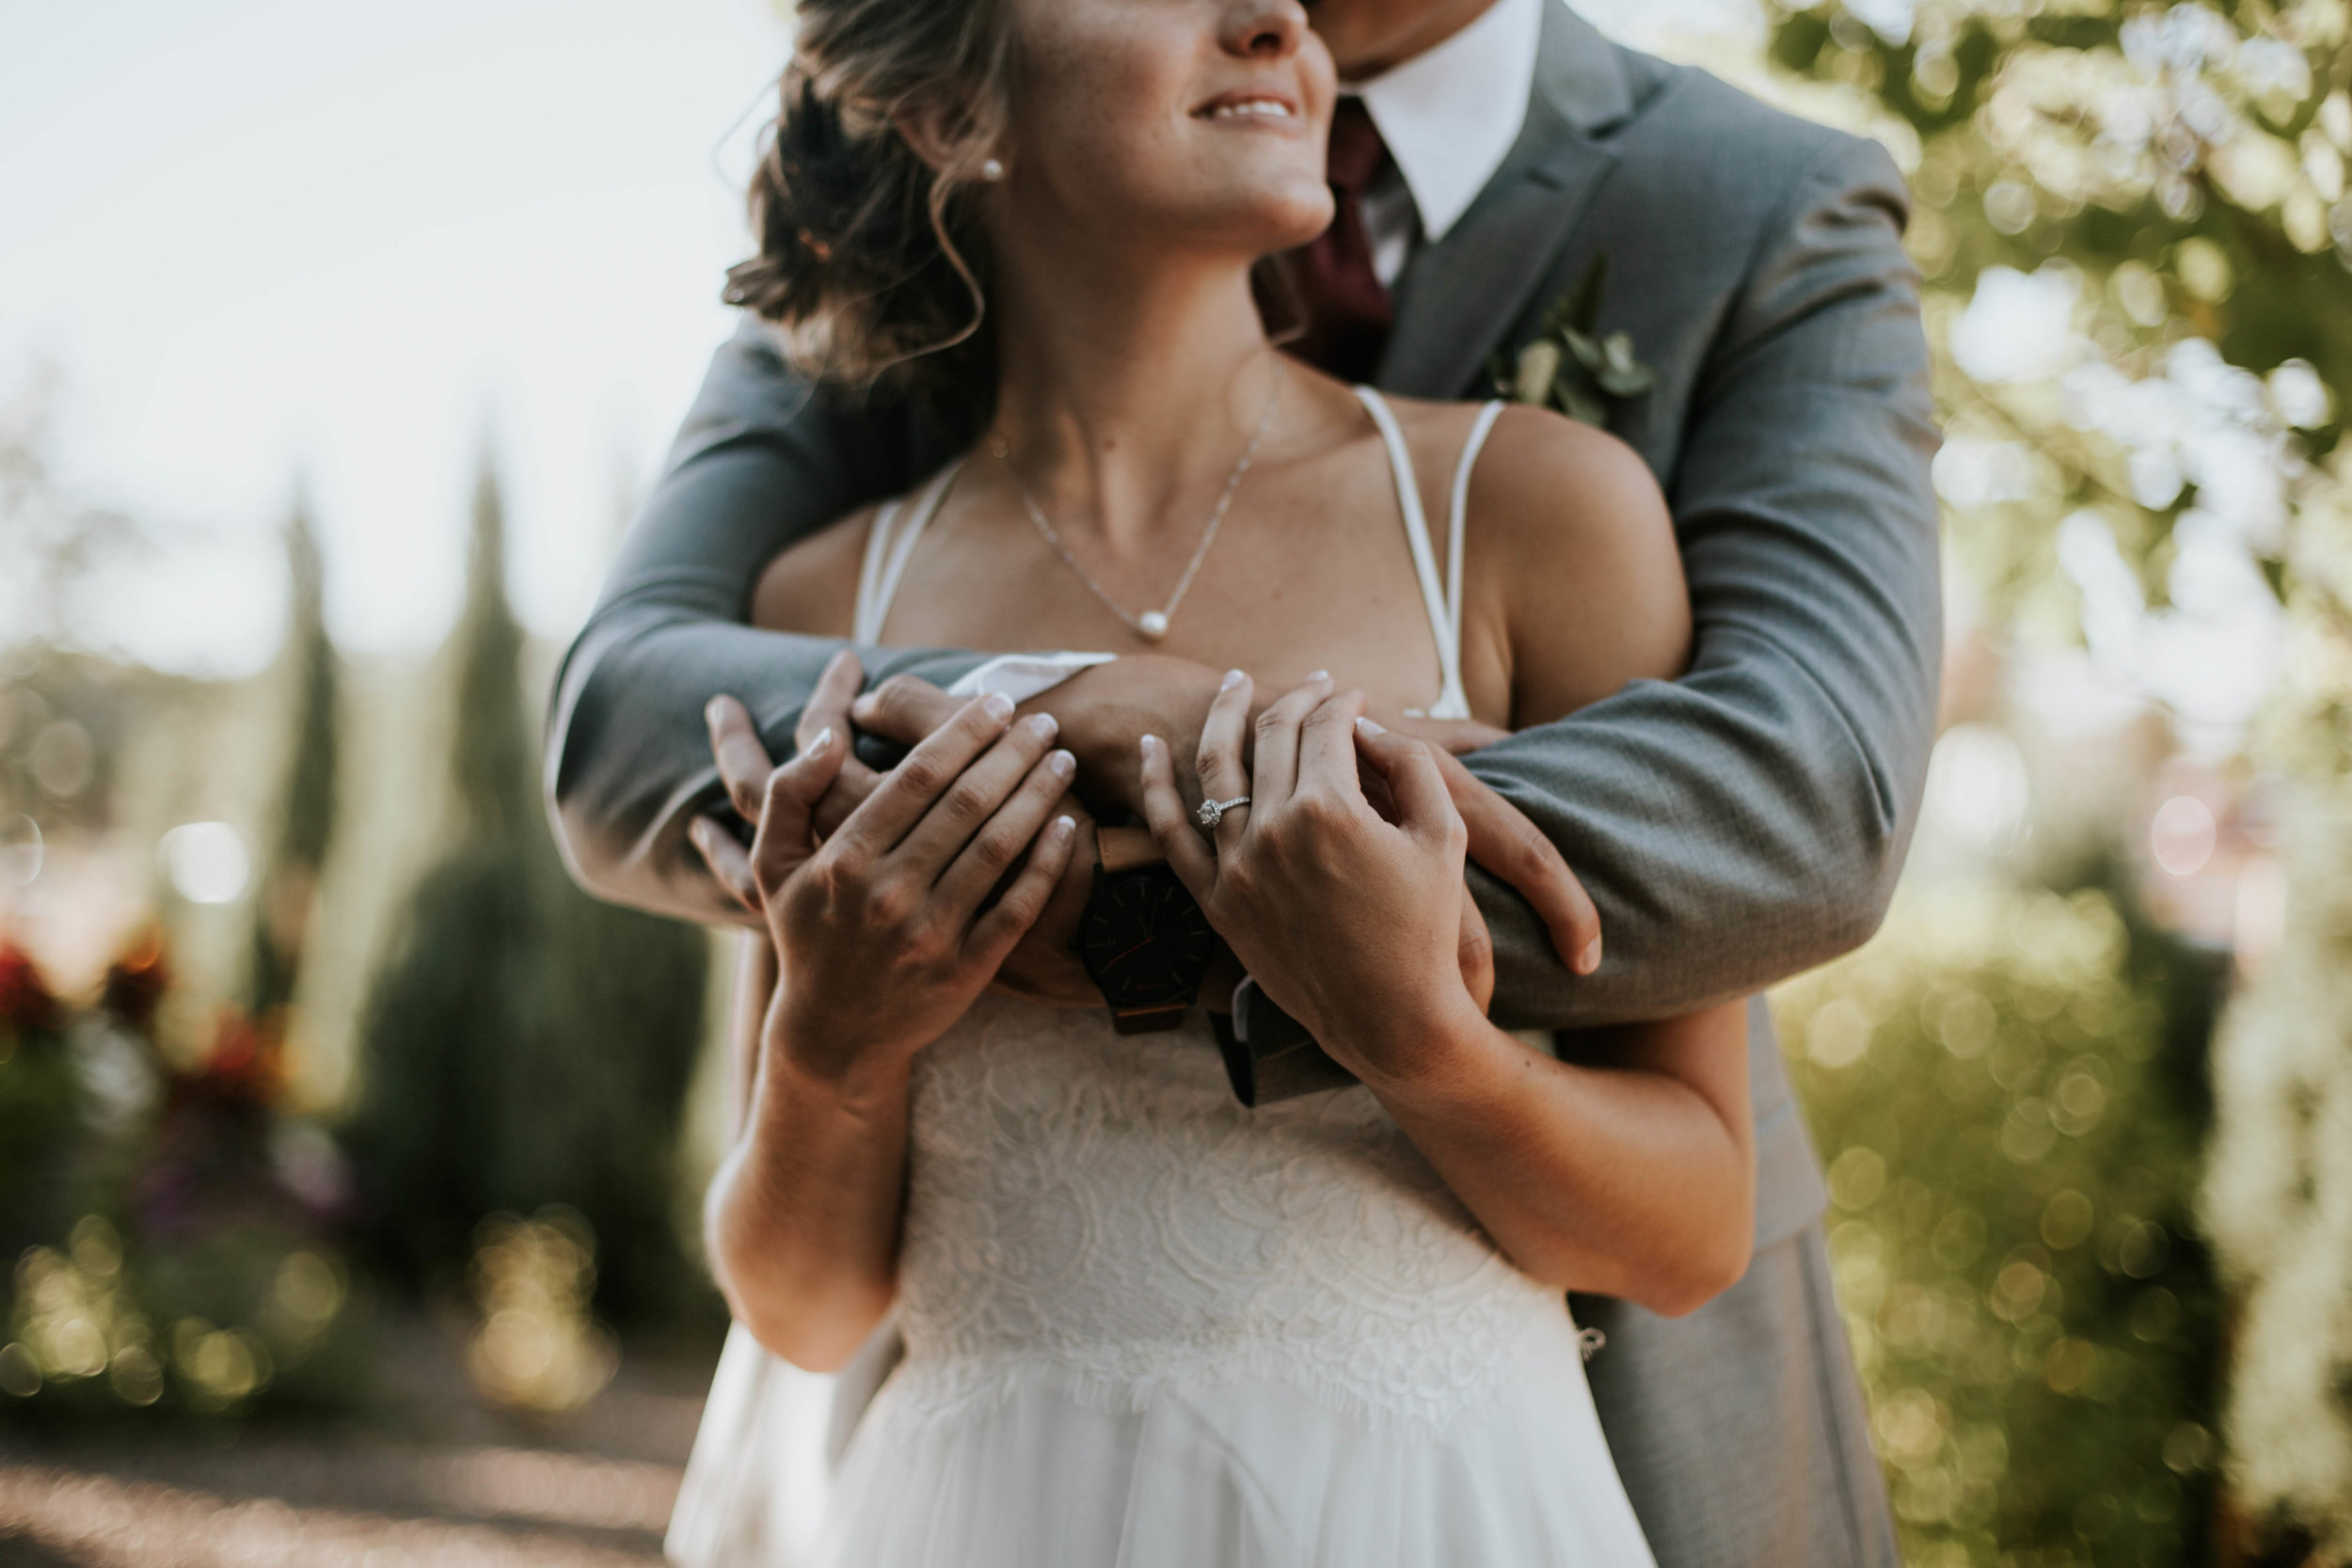 Wedding Photography, Redden Photography, Colorado Wedding, Oregon Wedding, Oregon Wedding Photography, Elopements, Elopement Photographer, Destination Weddings, Destination Wedding Photographer, Oregon Wedding Photographer, Portland Wedding Photographer